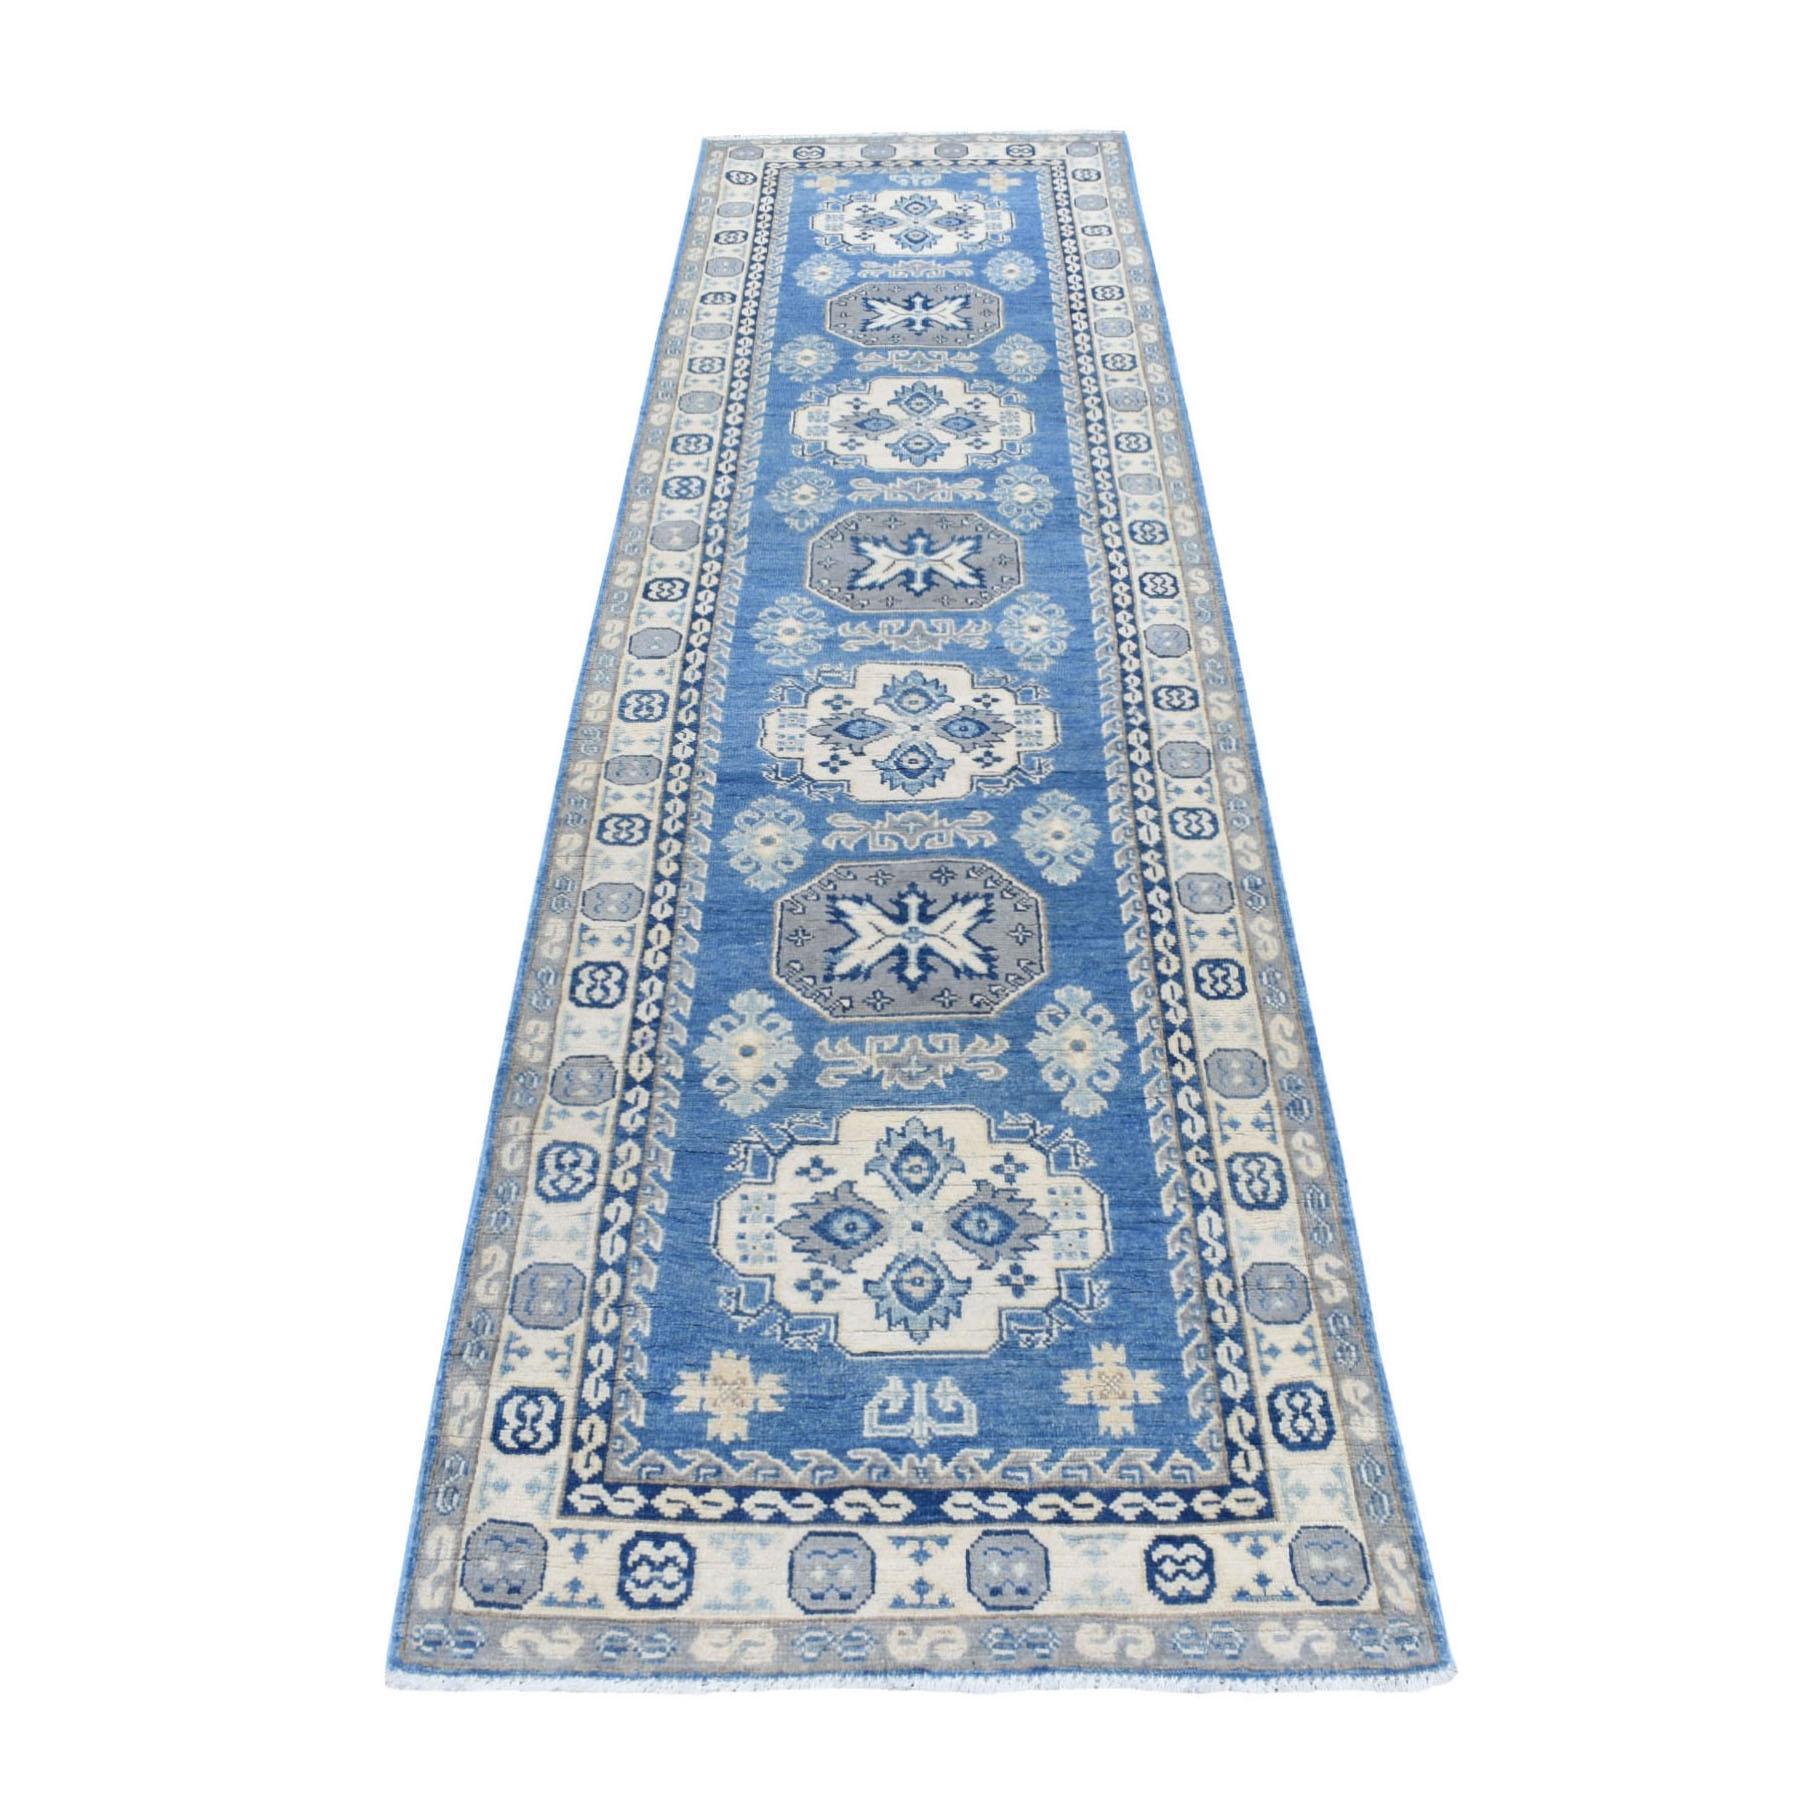 "2'7""x9'8"" Blue Vintage Look Kazak Organic Wool Tribal Design Hand Knotted Runner Oriental Rug"